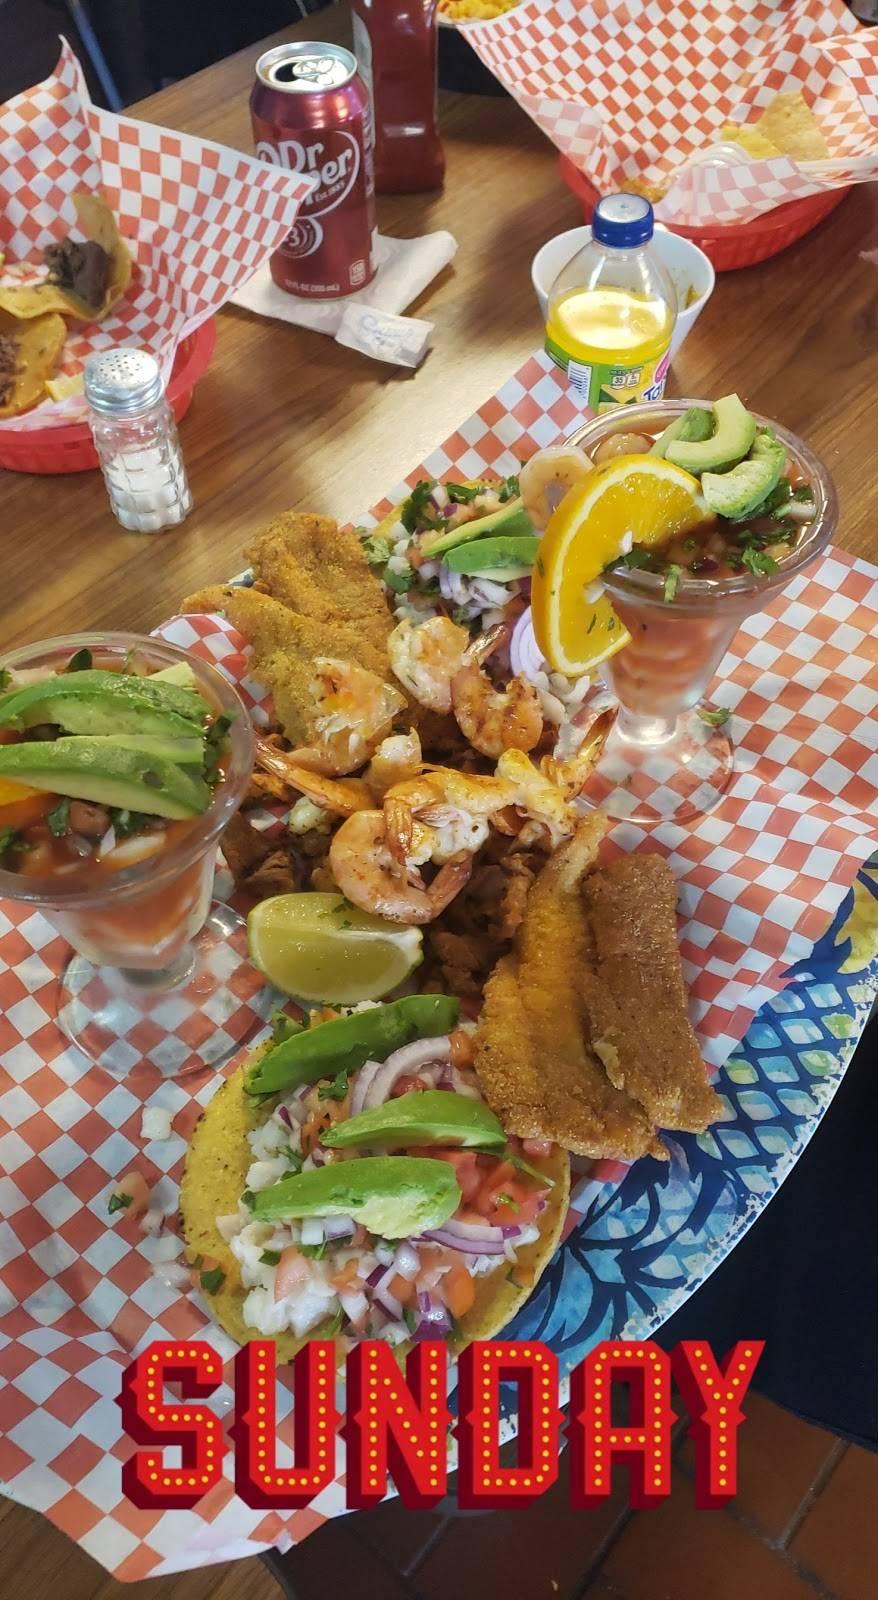 El Guero seafood mariscos comida mexicana - restaurant  | Photo 3 of 9 | Address: 10230 Harry Hines Blvd, Dallas, TX 75220, USA | Phone: (214) 357-2213